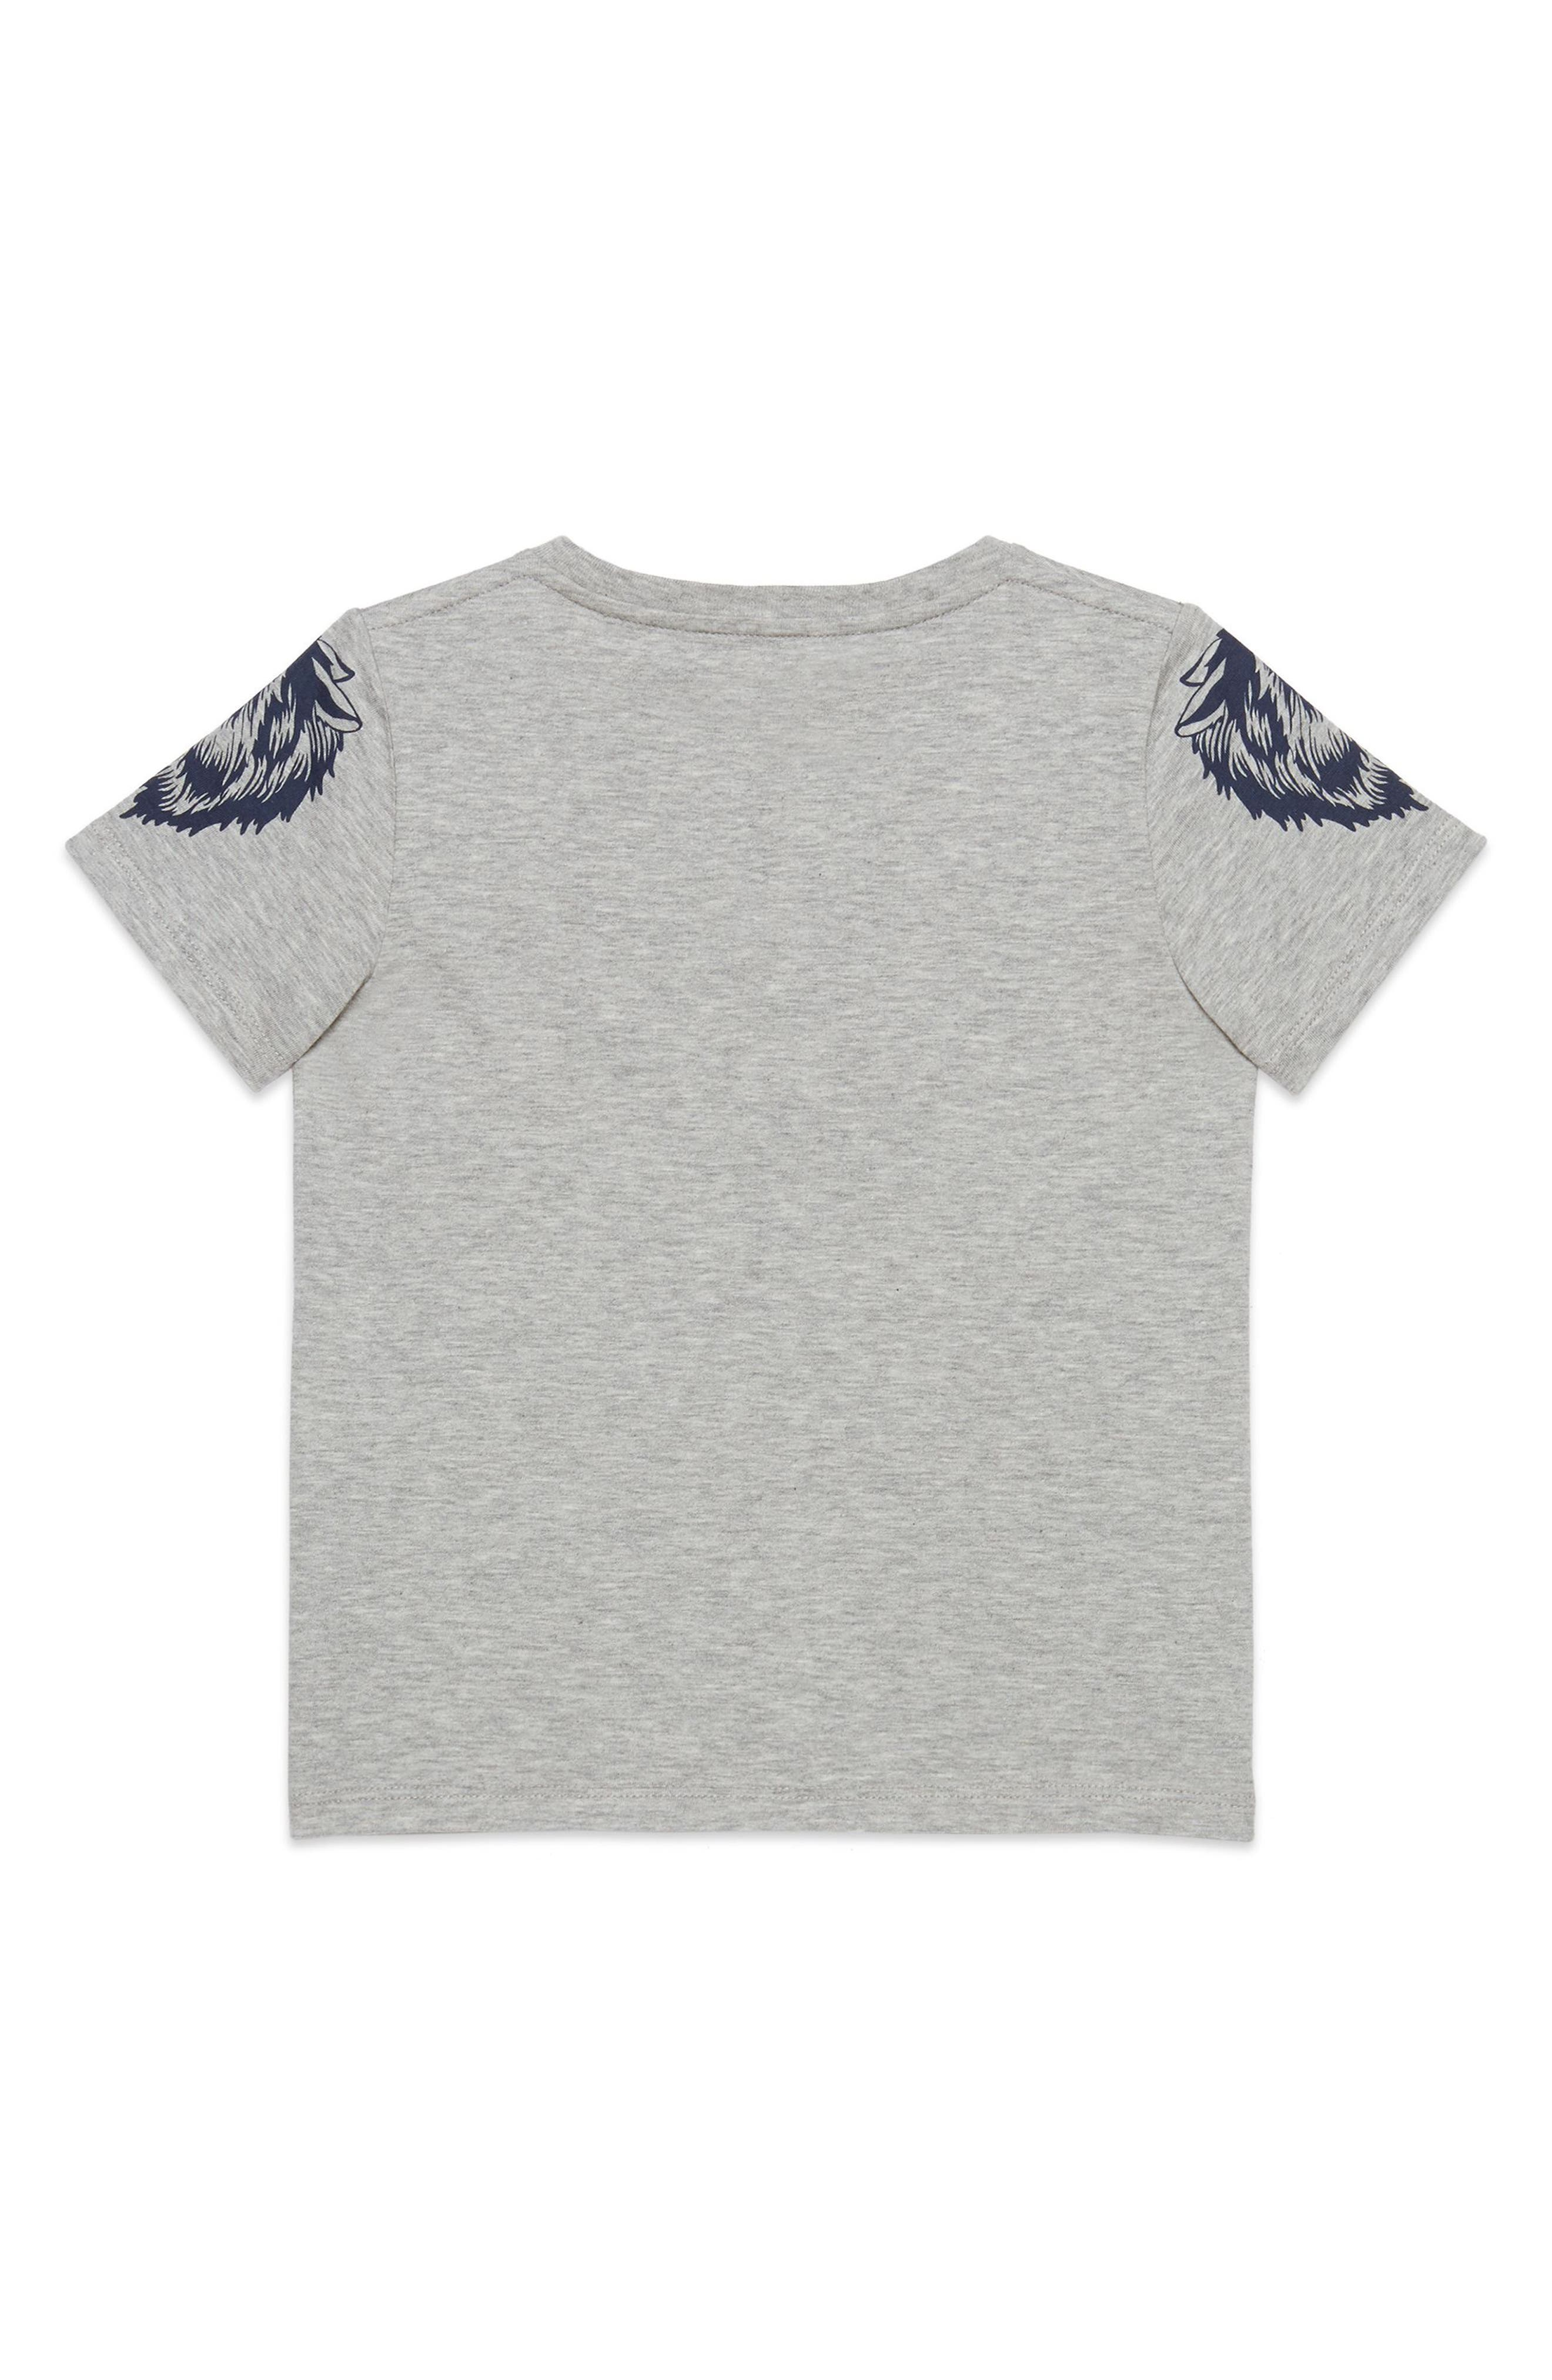 Guccy Monster & King Snake Graphic T-Shirt,                             Alternate thumbnail 2, color,                             L.GREY MEL B/ R/ B